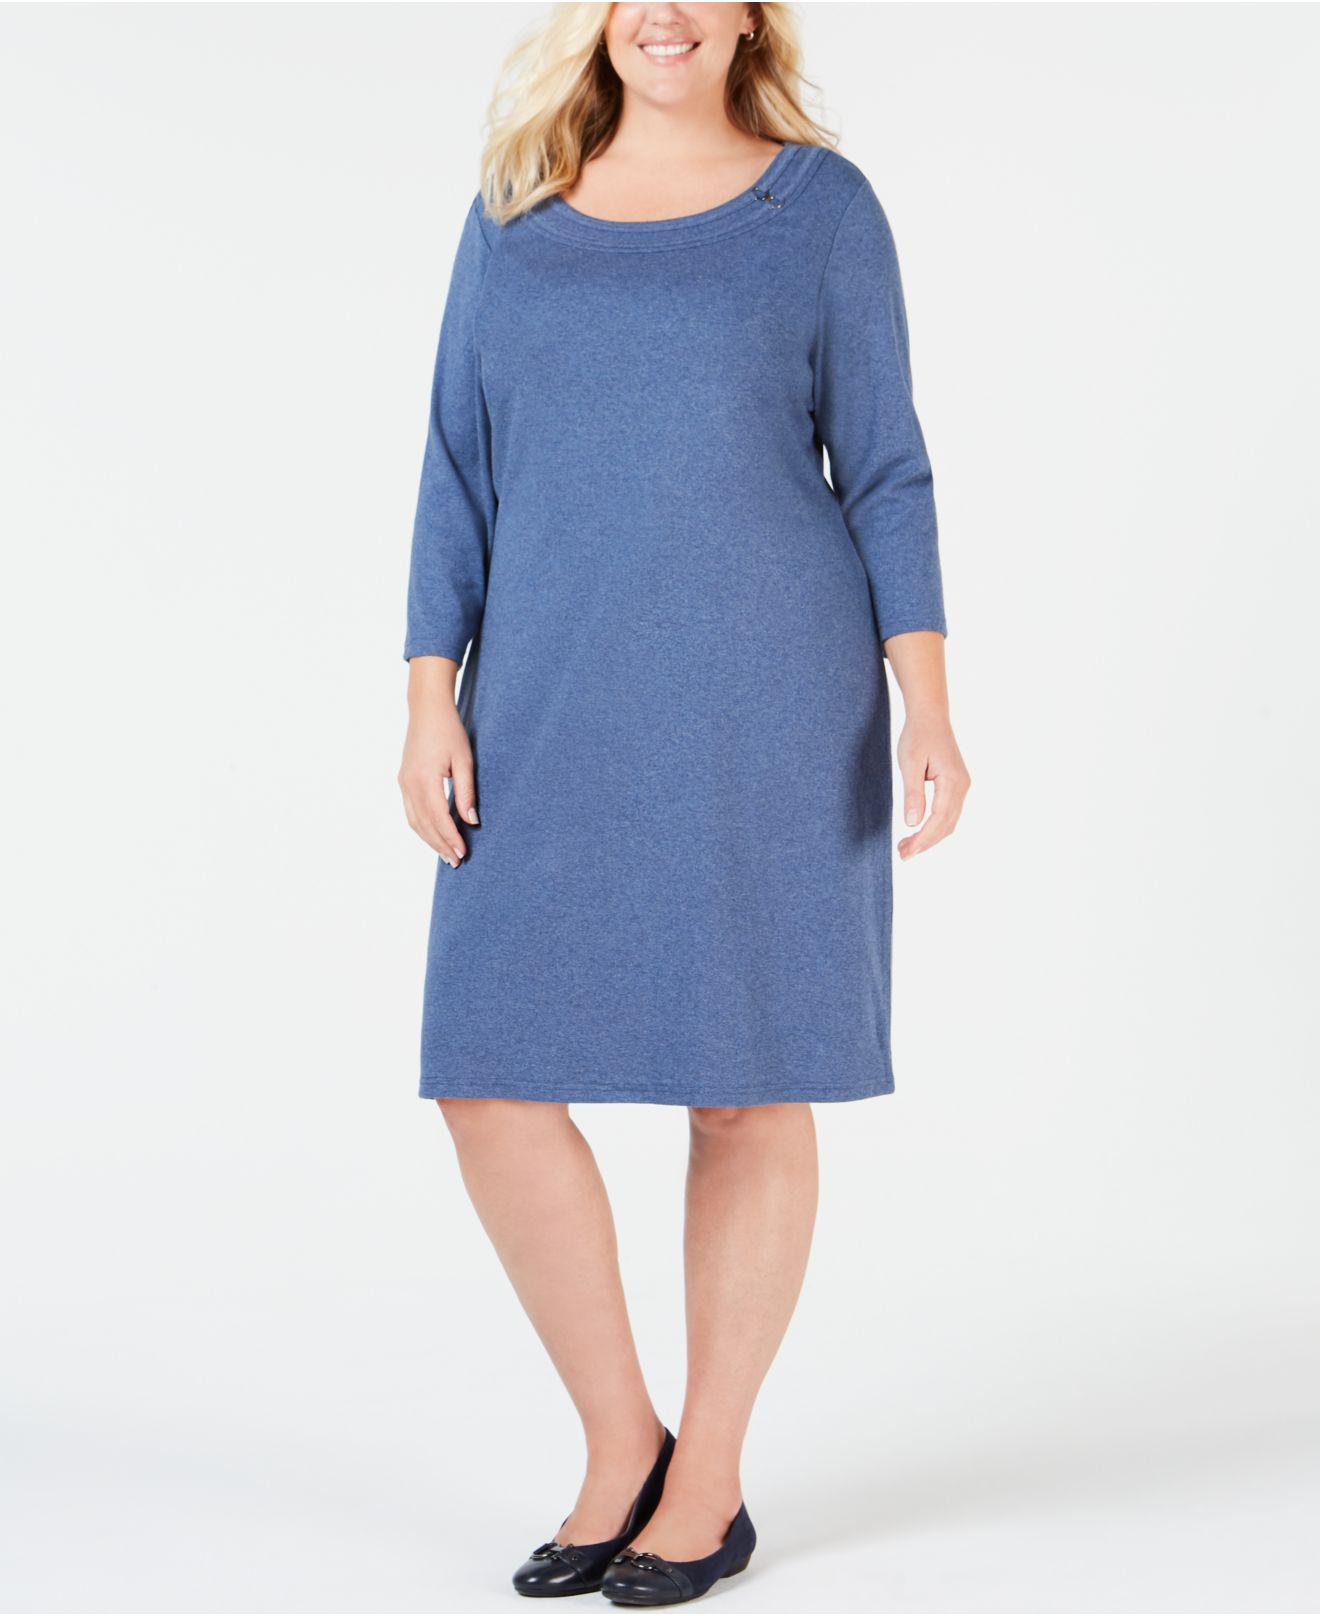 9ba6ecf1520 Karen Scott. Women s Plus Size Cotton Scoop-neck Dress